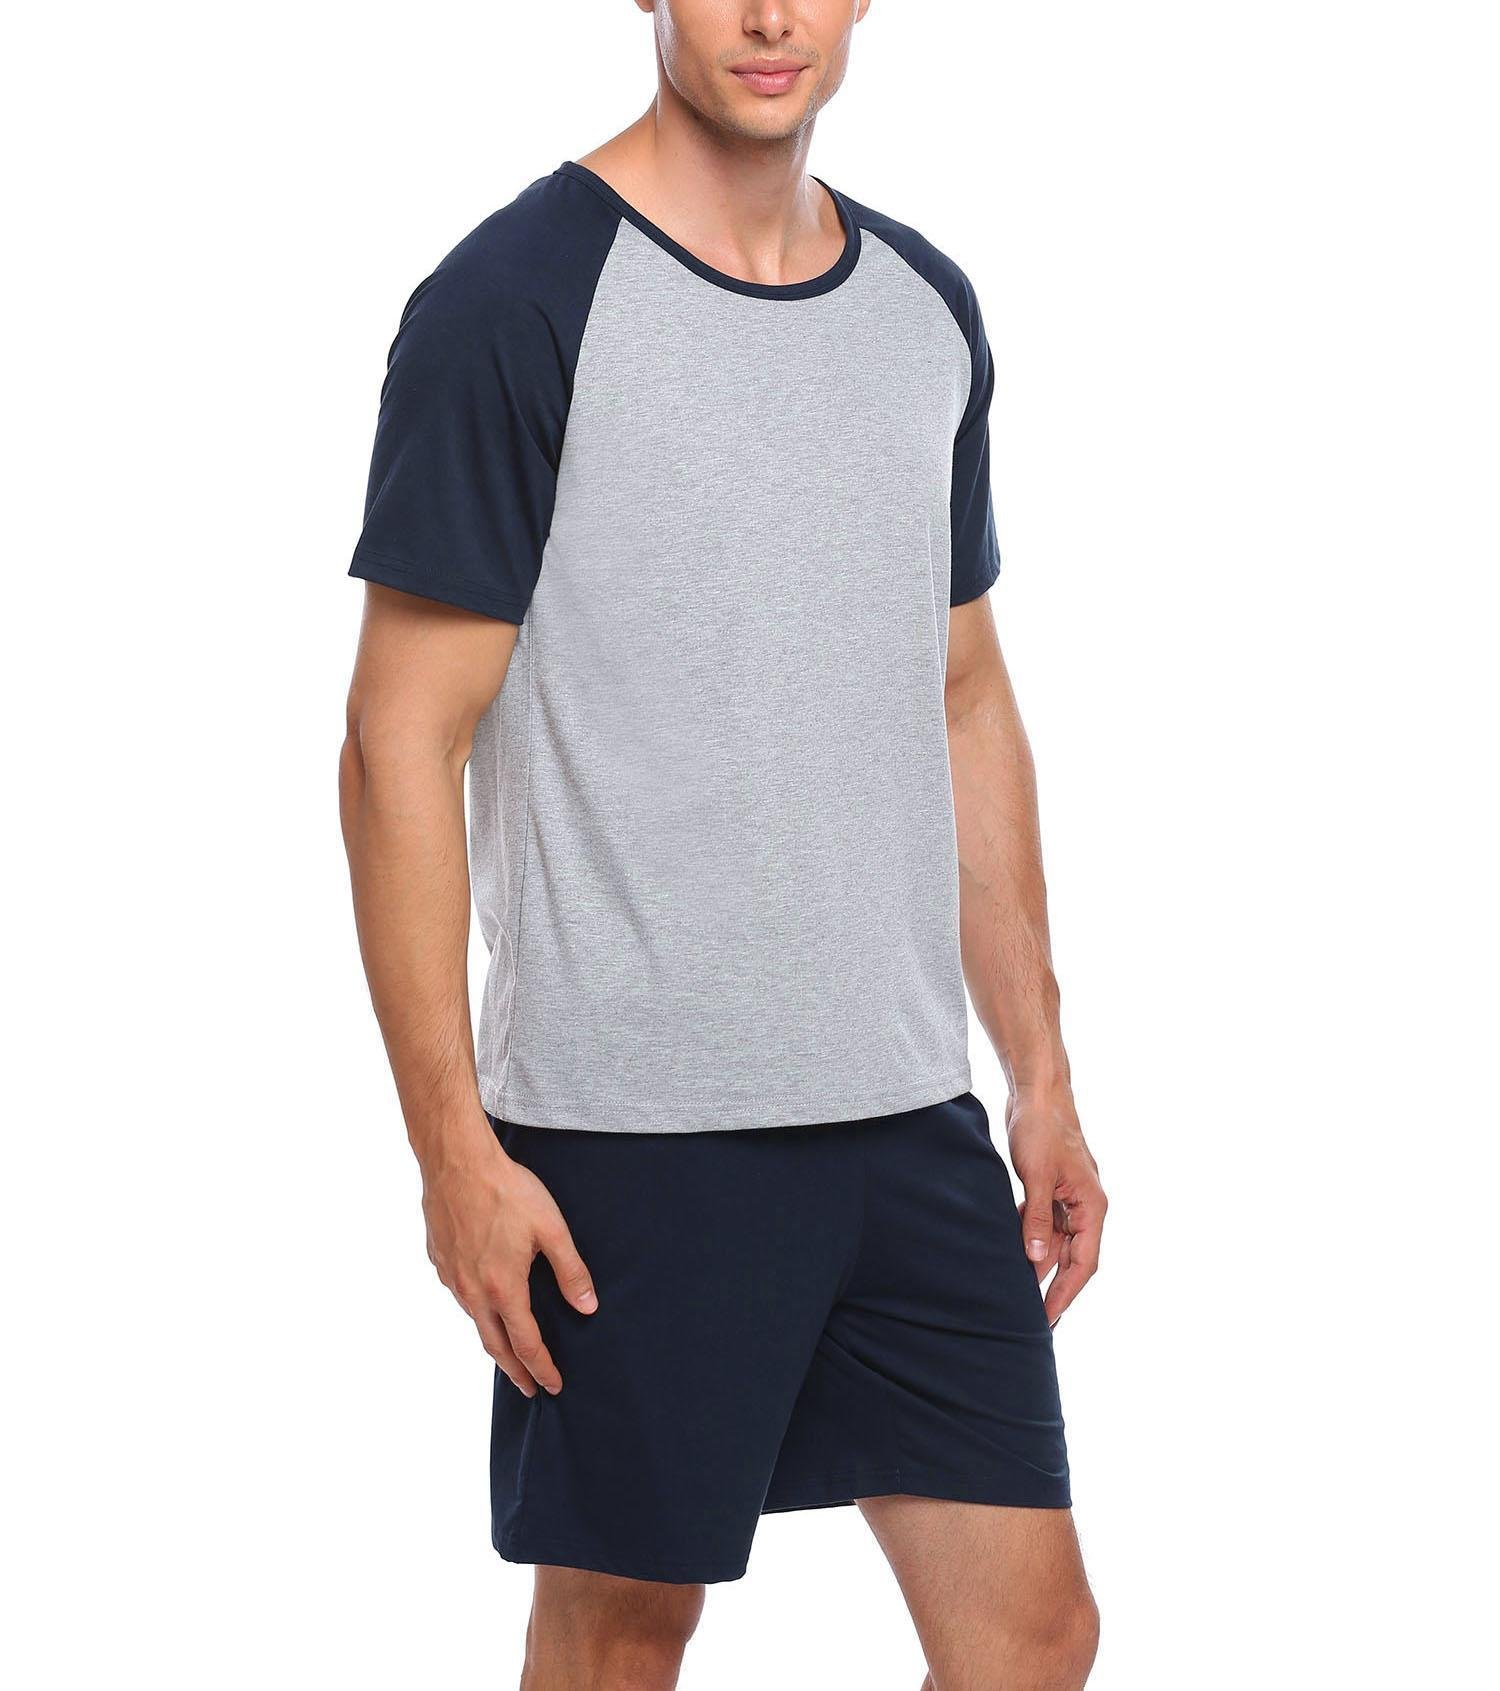 Zouvo Mens O-Neck Pajamas Sets Short-Sleeve Top with Shorts Loungewear(Dark Blue, X-Large)